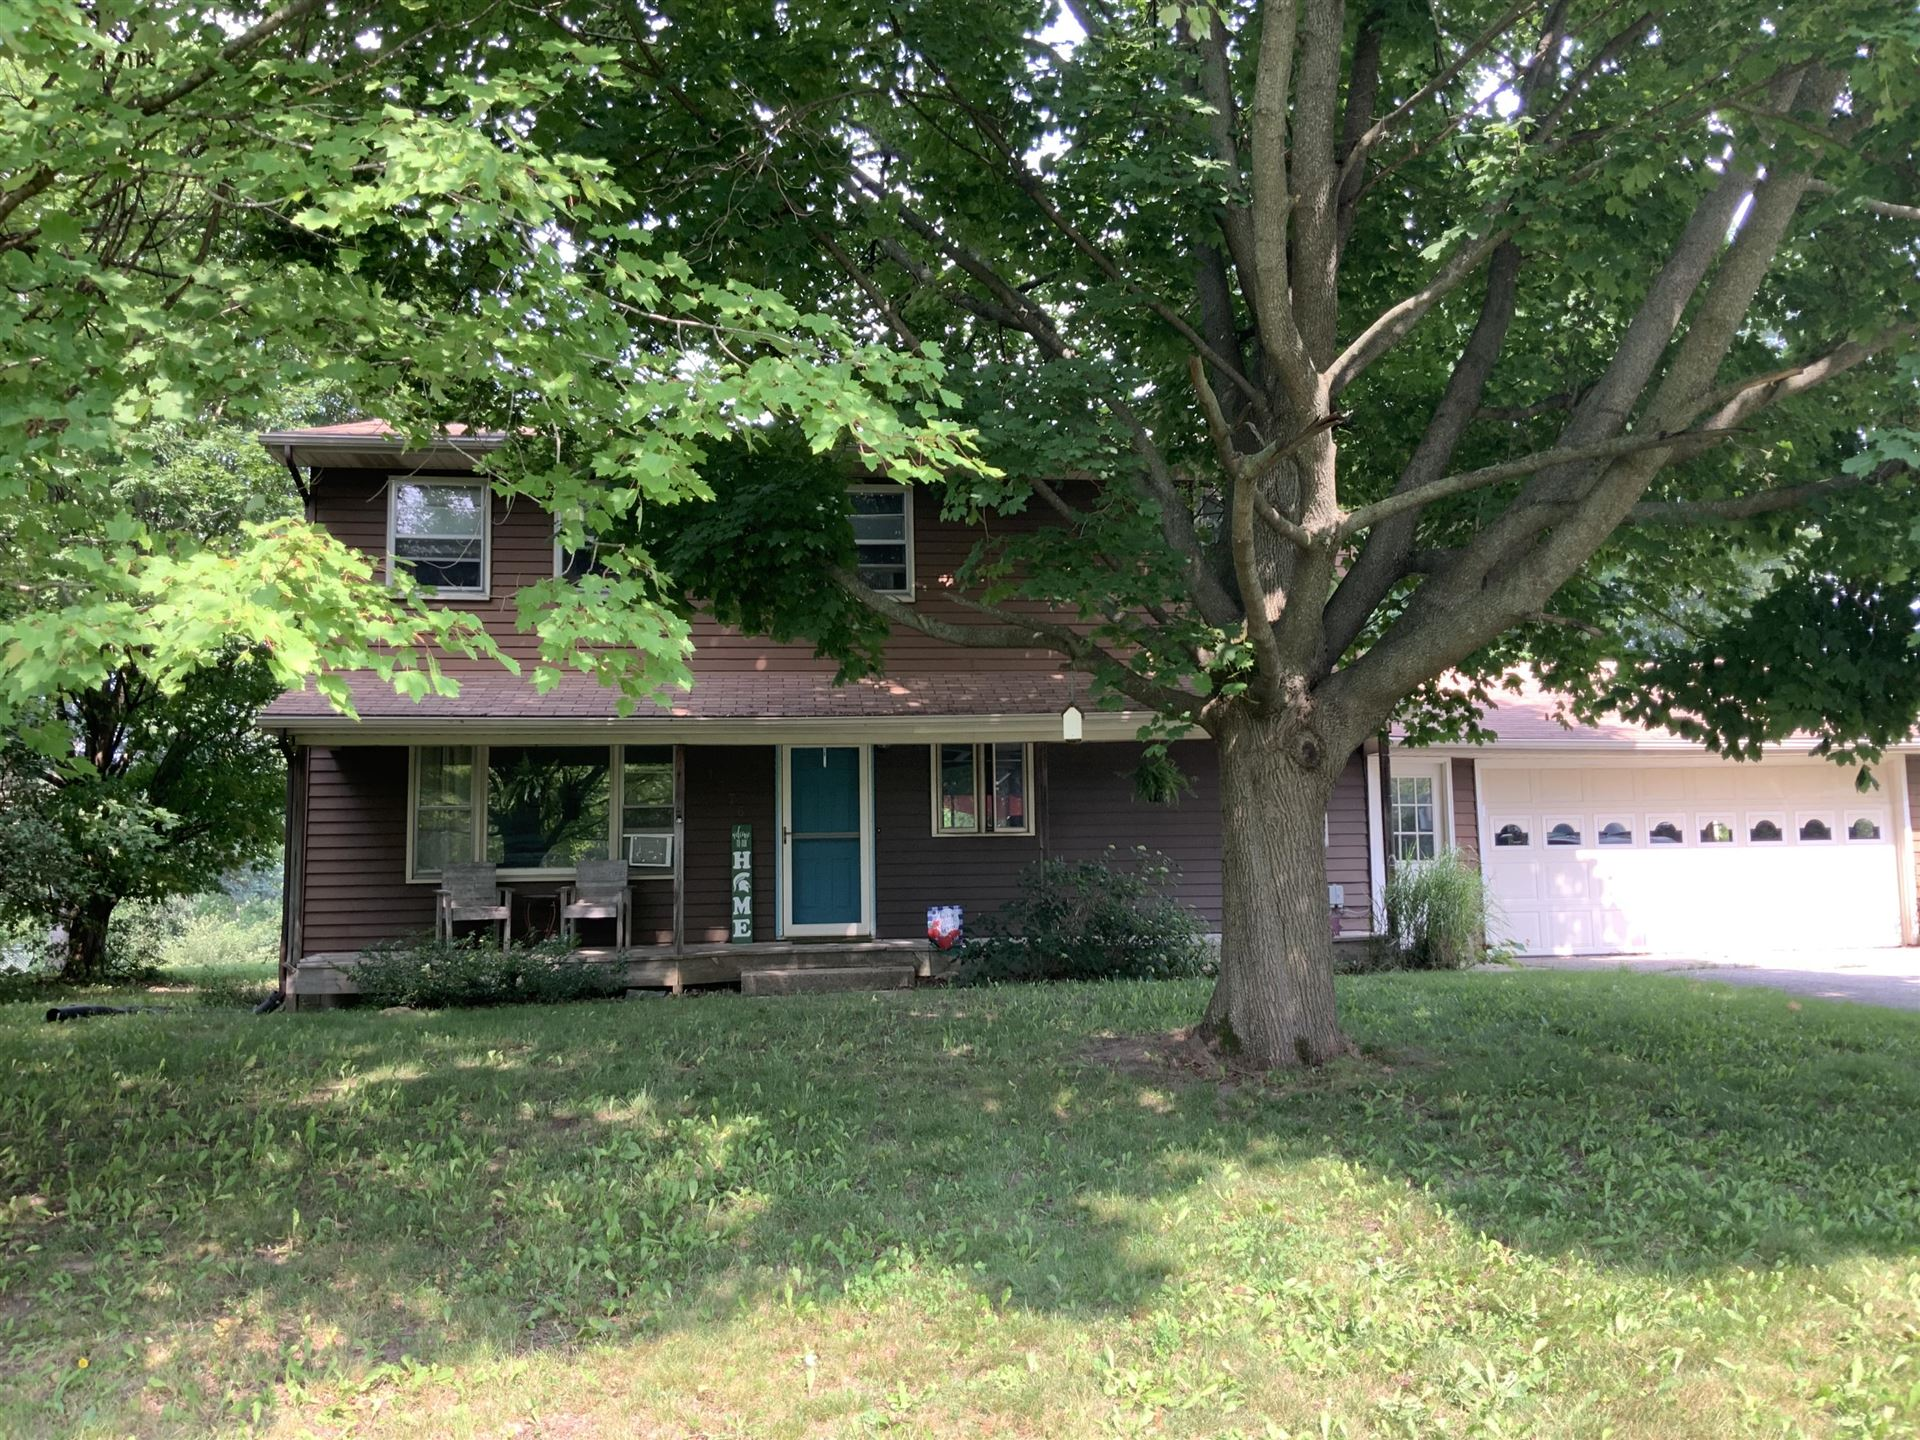 Photo of 1376 Spaulding Avenue SE, Grand Rapids, MI 49546 (MLS # 21069930)